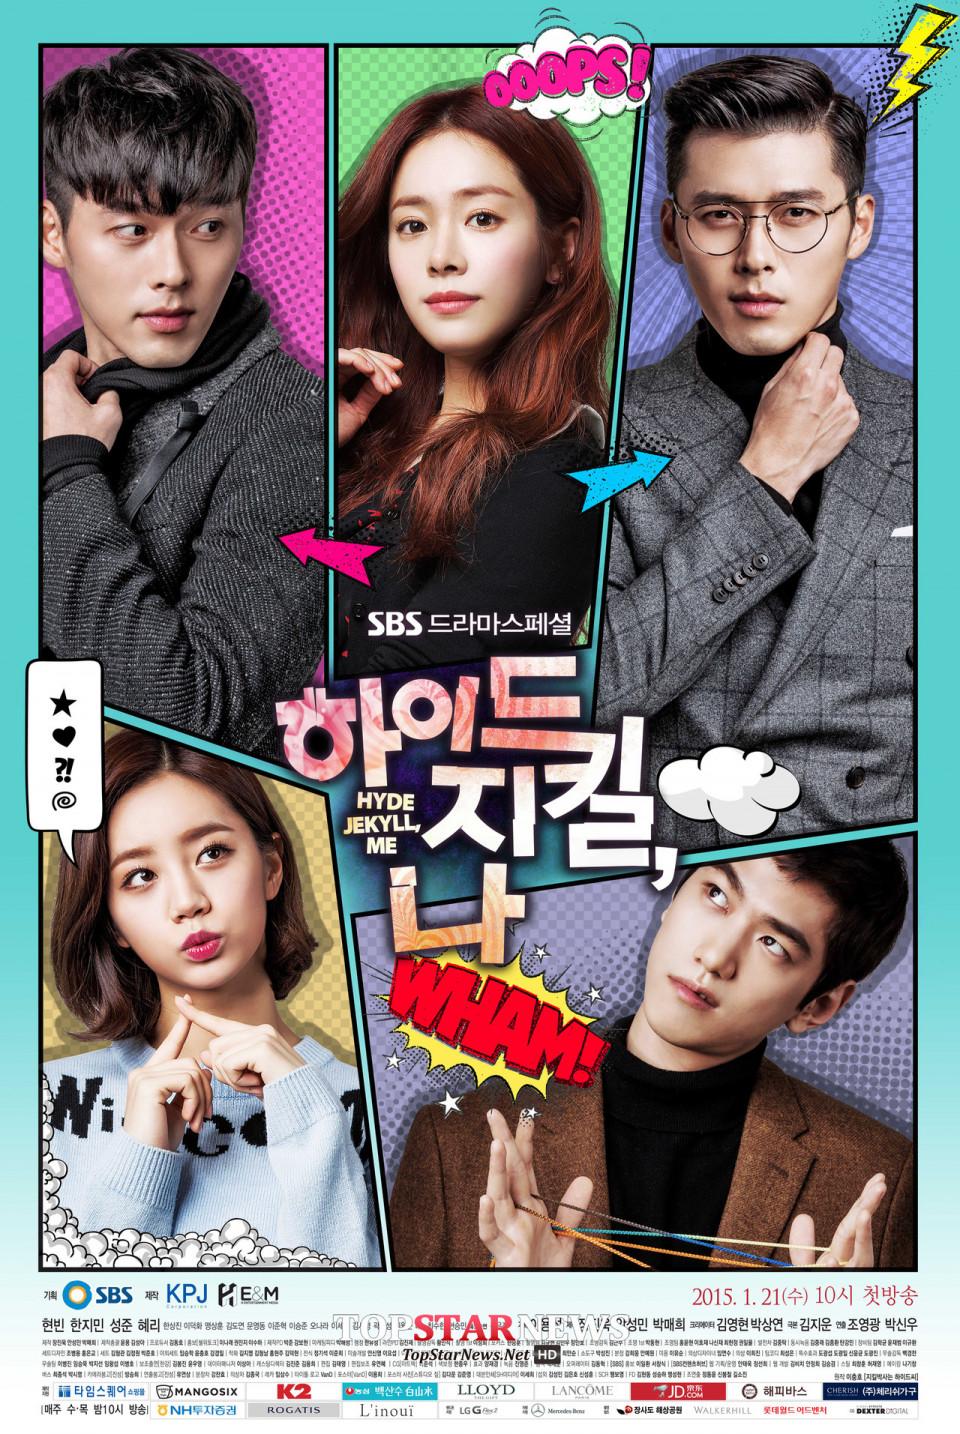 Kurang Laku di Pasaran, 5 Drama Korea Adaptasi Komik Ini Gagal Memikat Penonton - Foto 5